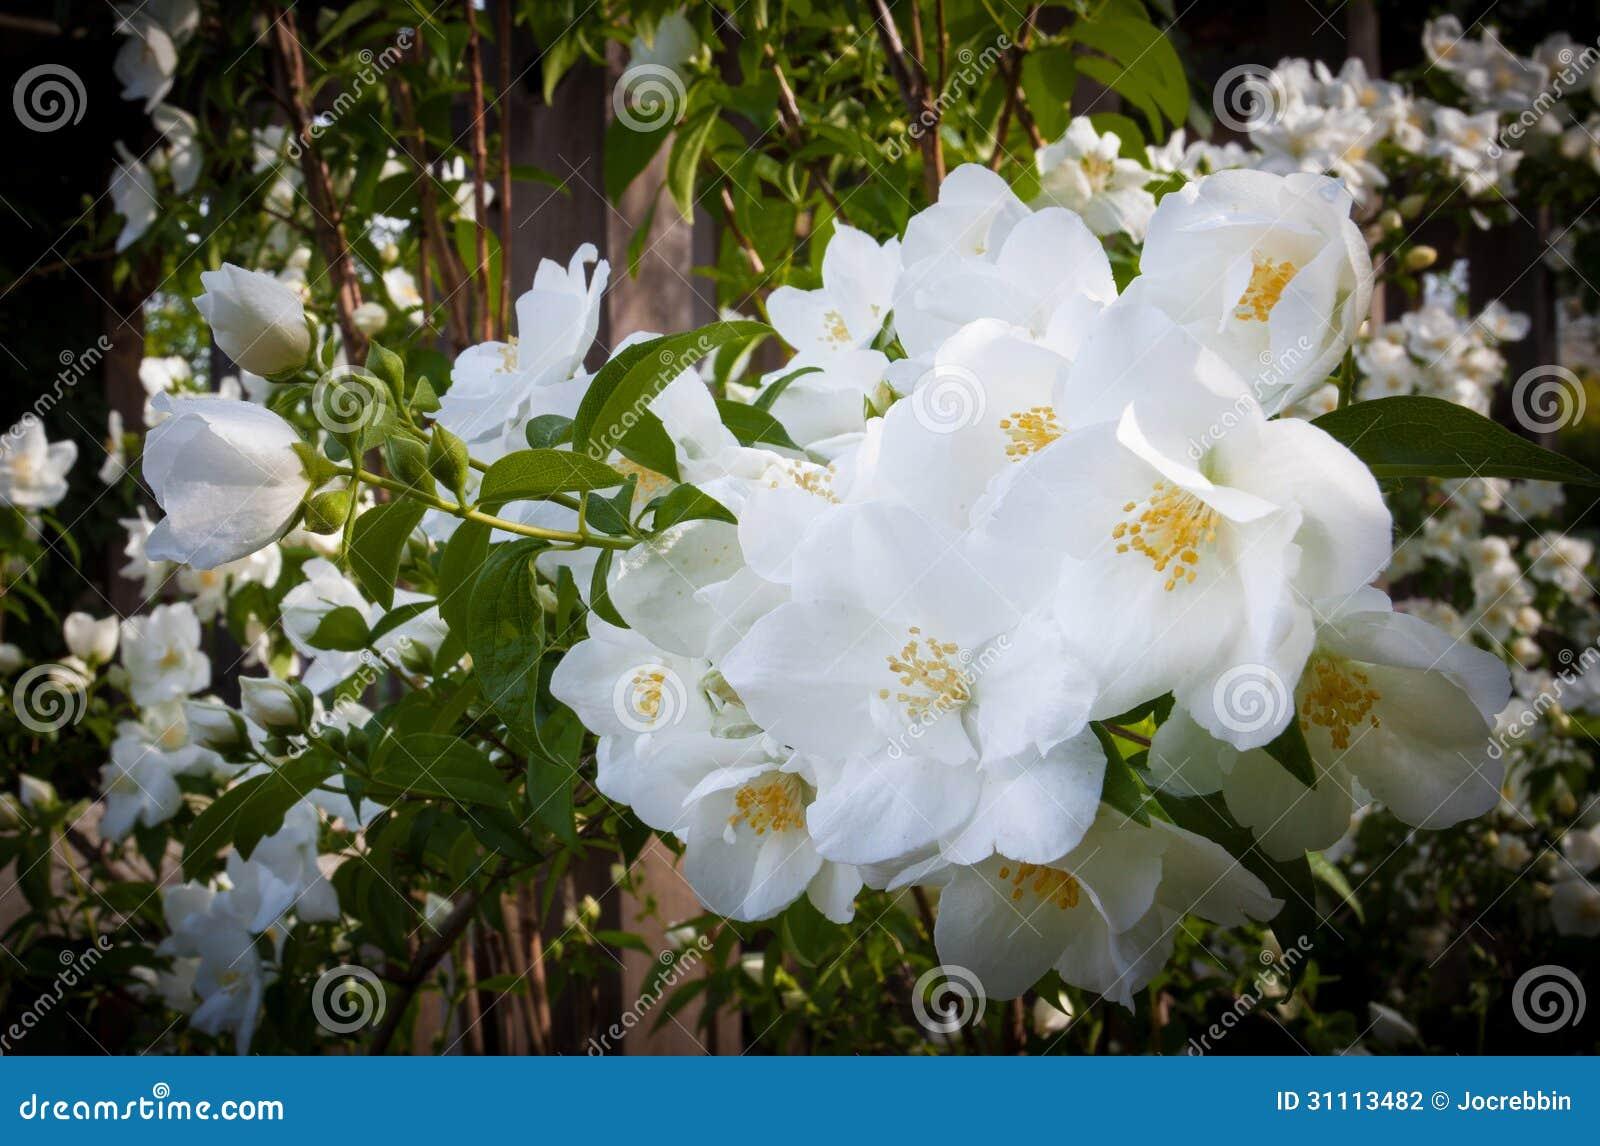 Roses In Garden: Delicate, White, Knock-out Roses In Full Bloom Stock